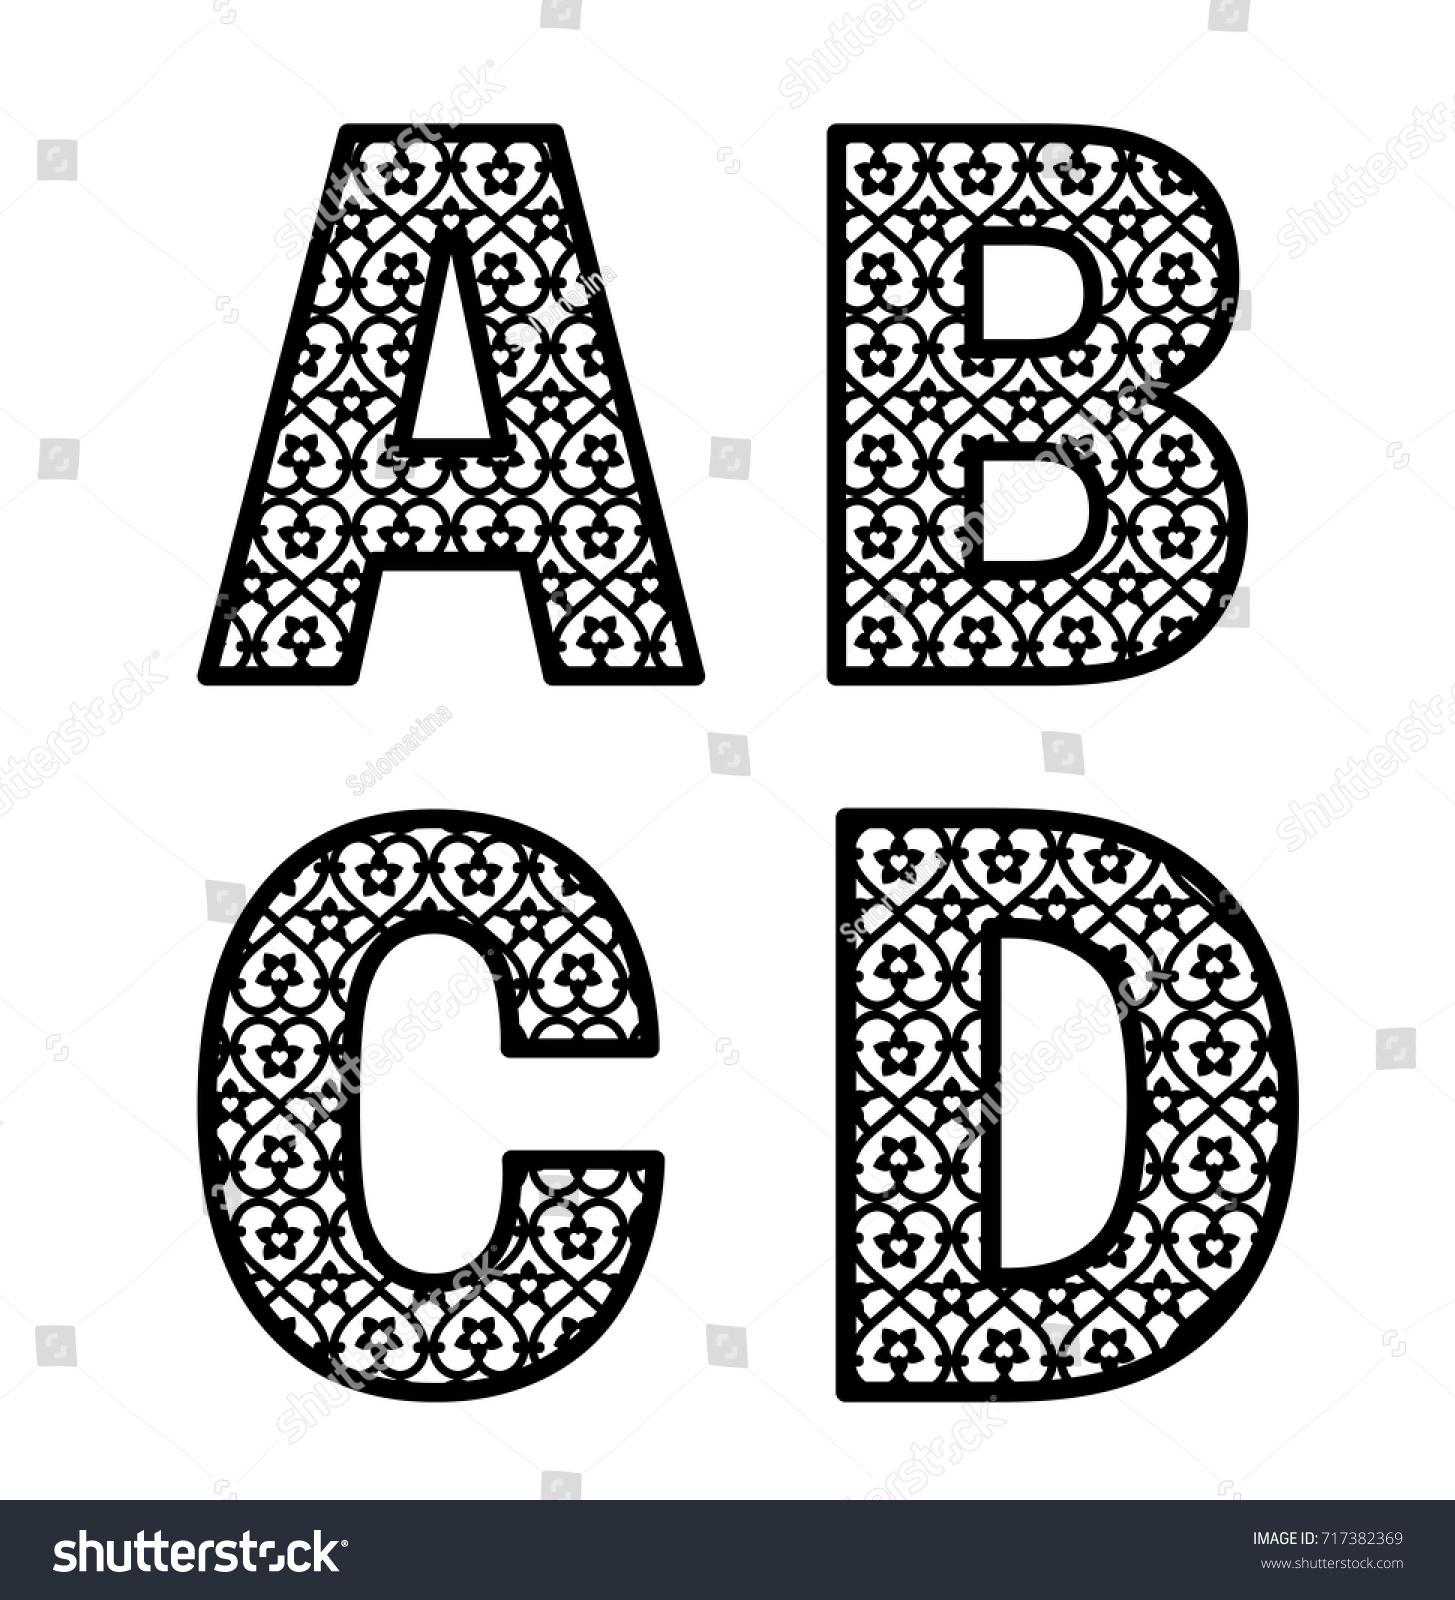 Letters A B C D Laser Stock Vector 2018 717382369 Shutterstock